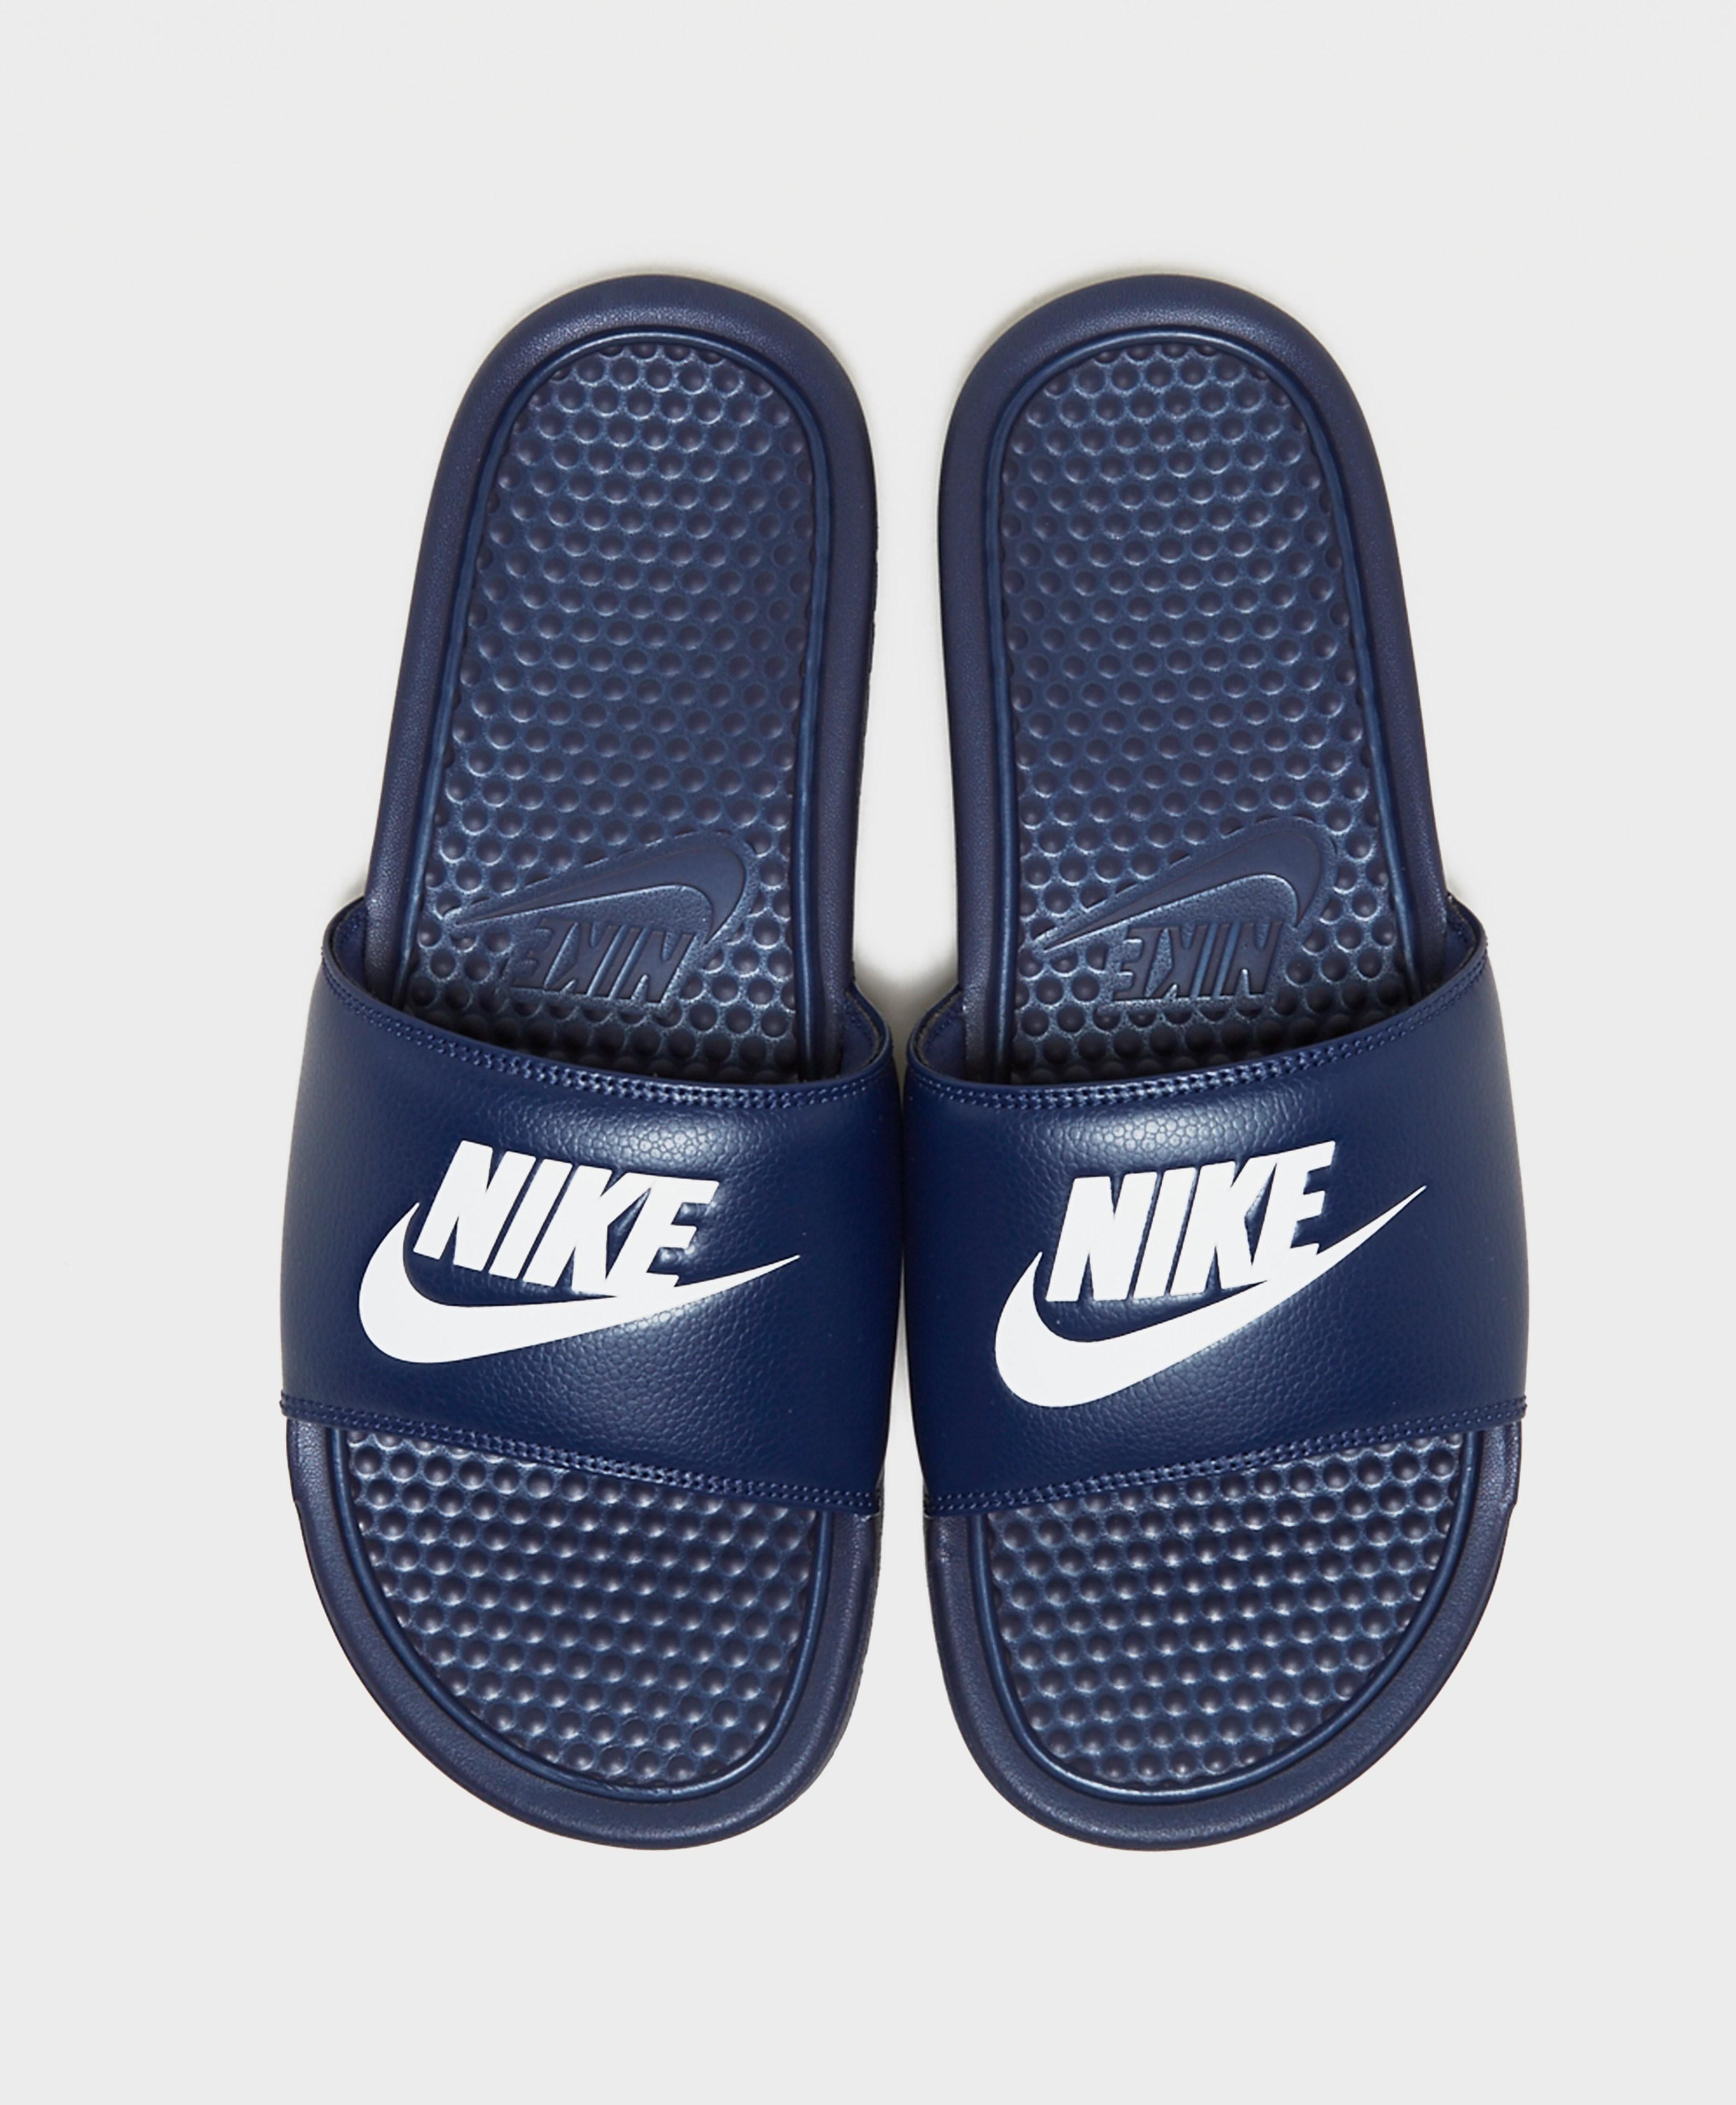 cc0f5cfb9 Nike Benassi Slides - Navy blue